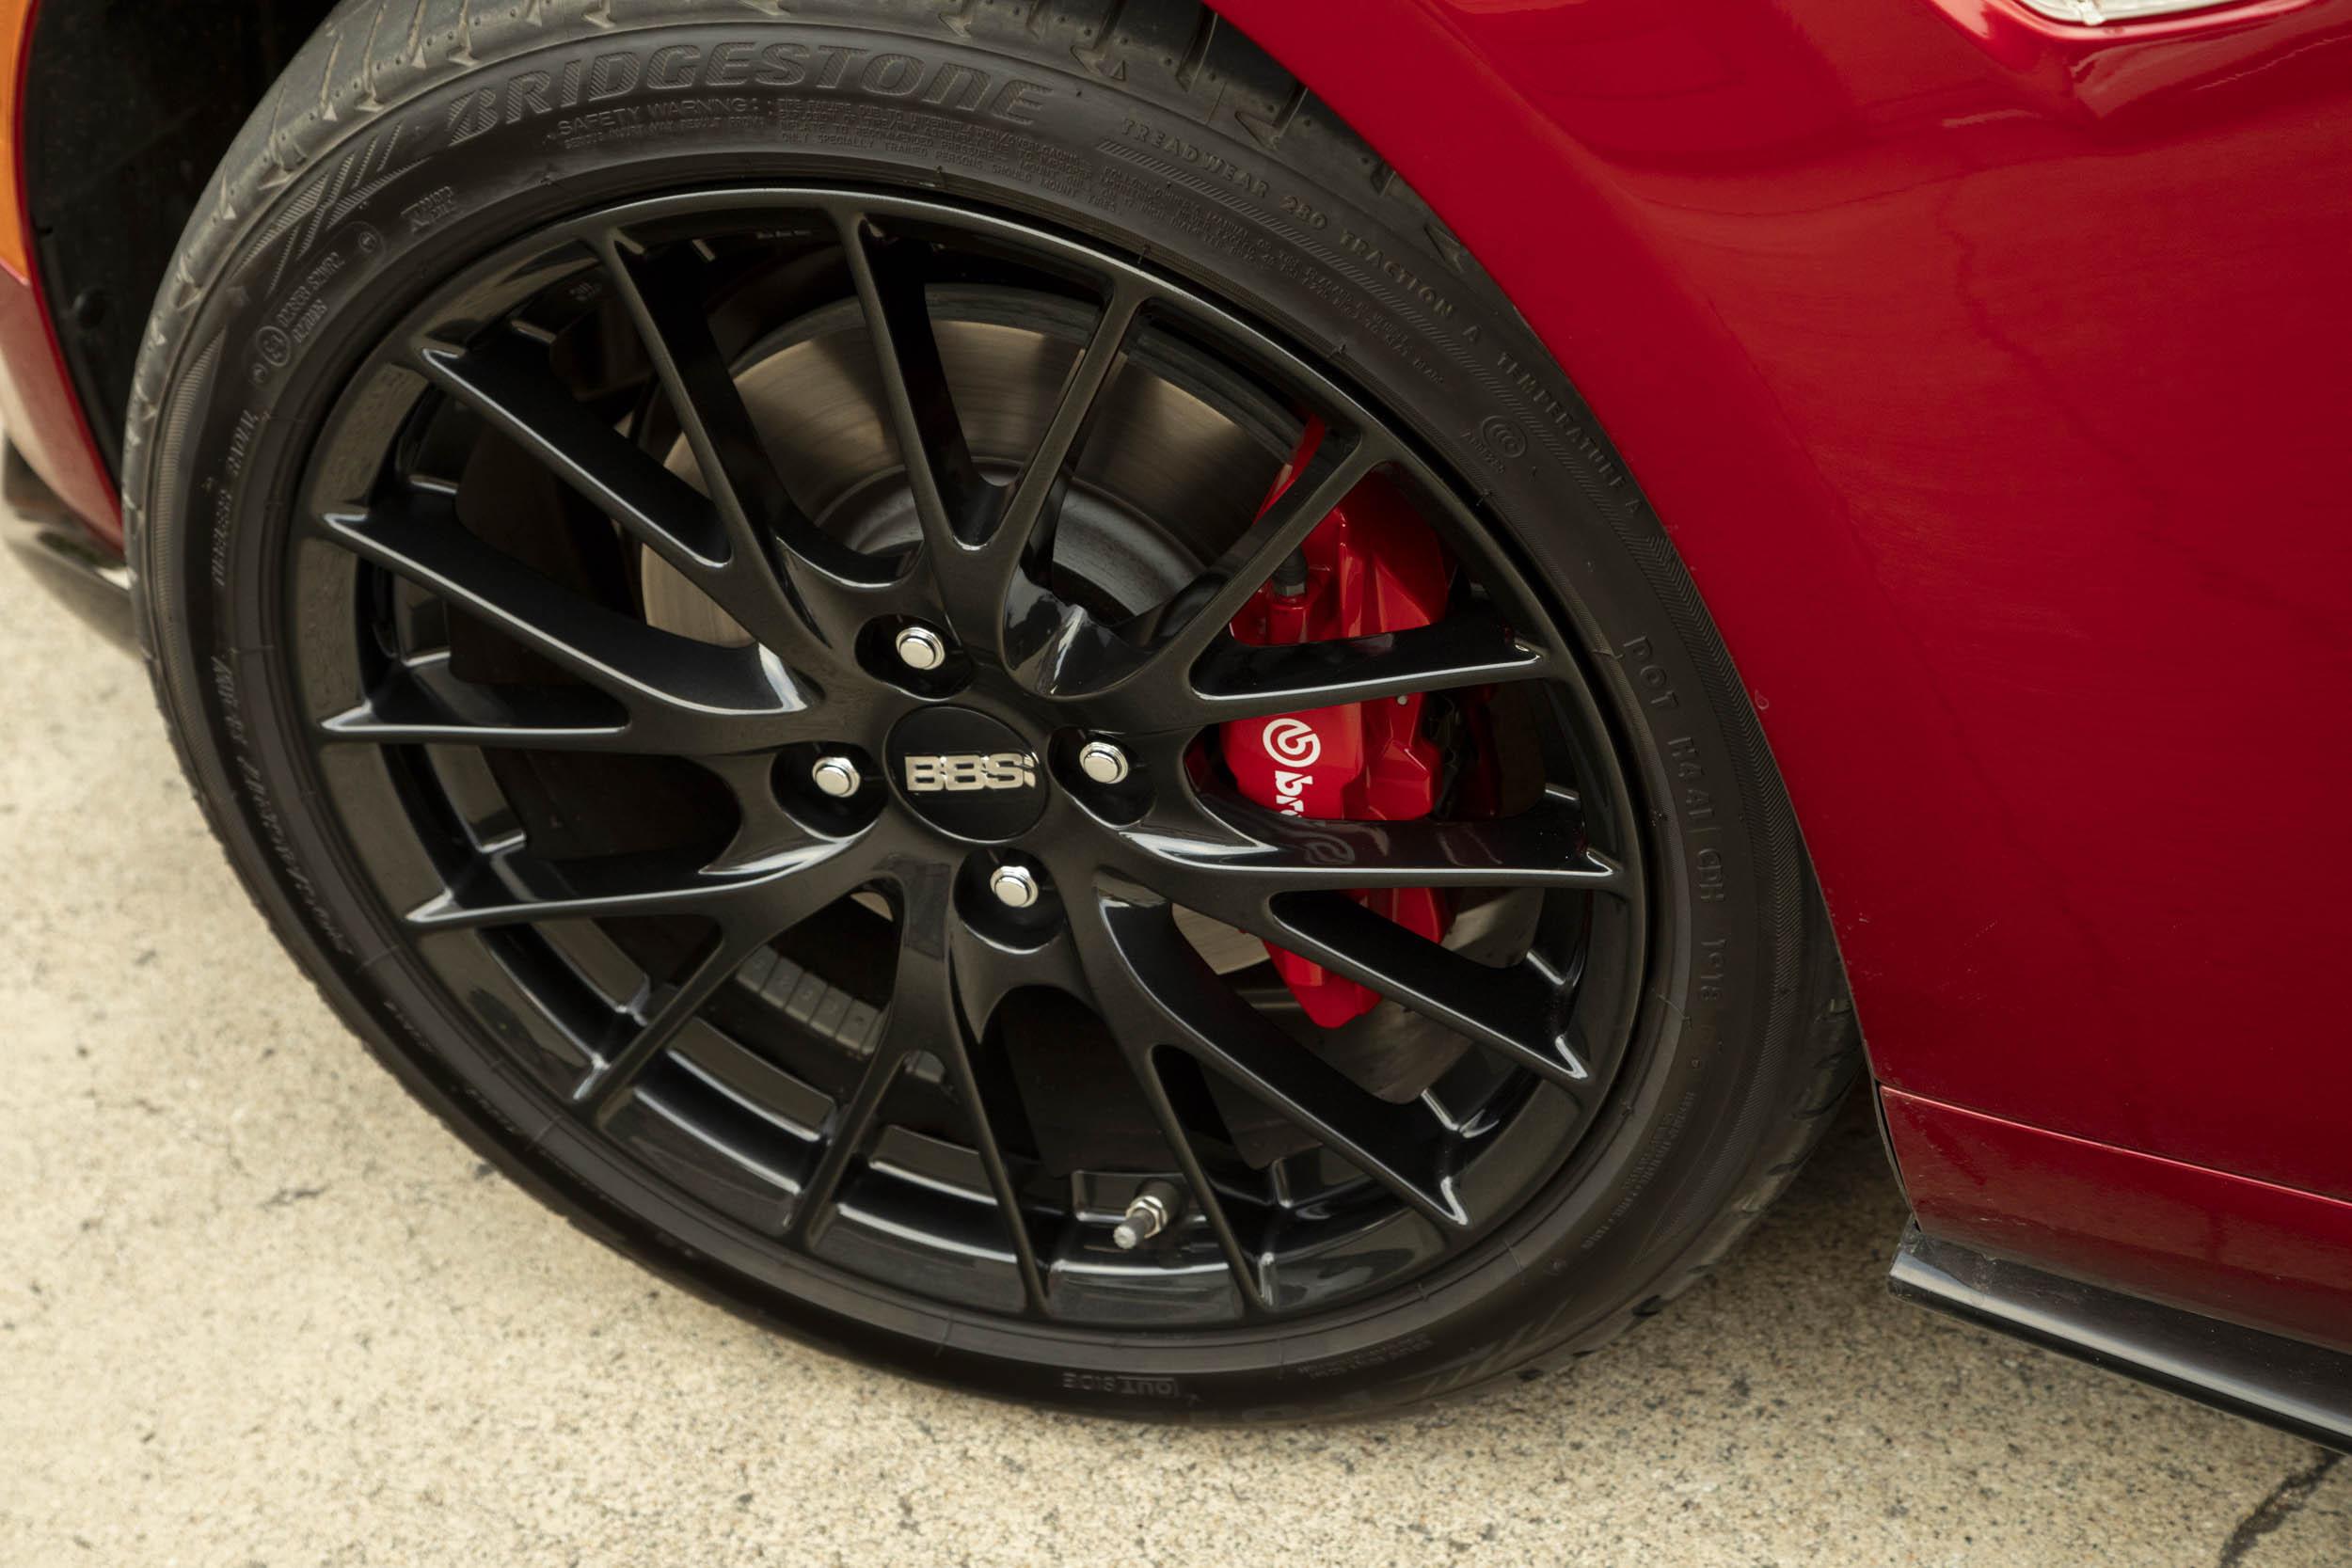 2019 Mazda MX-5 Miata wheel detail